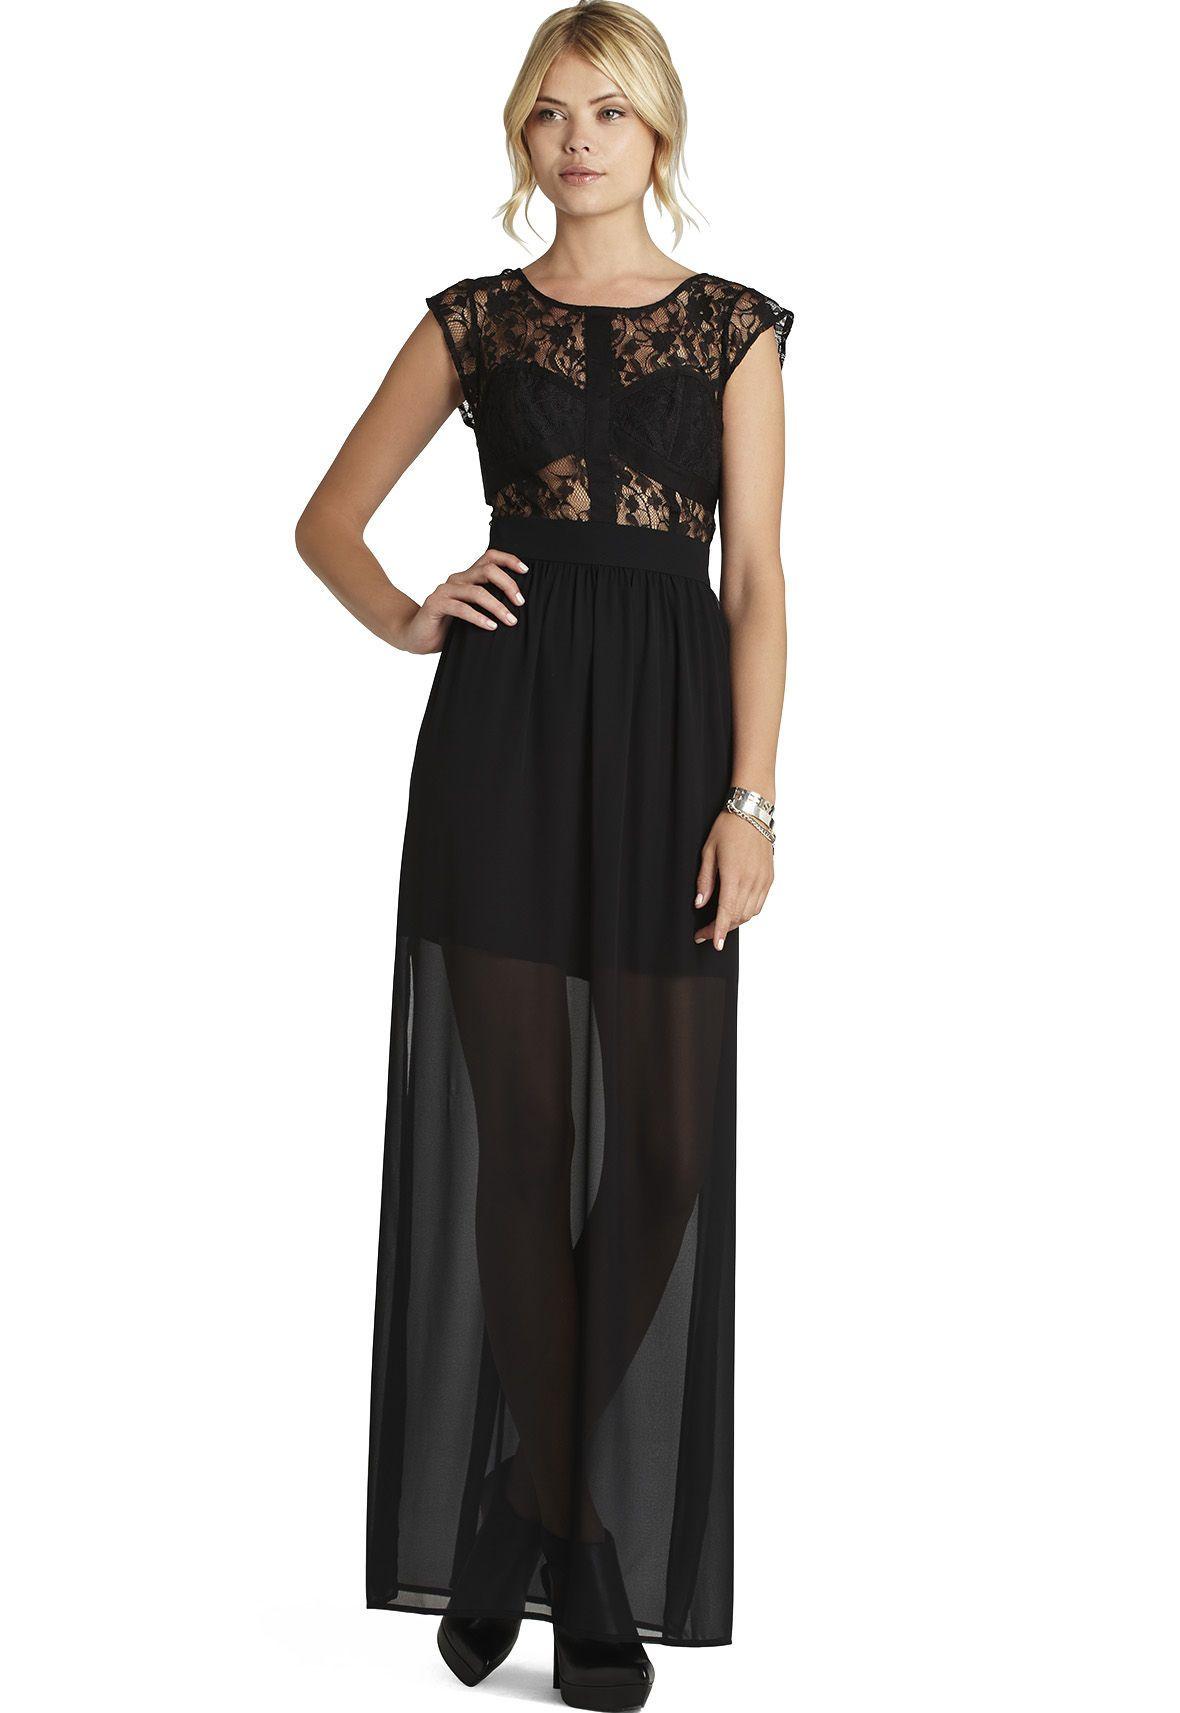 Wedding dresses crewe  Black Sleeveless Sheer Lace Insert Backless Maxi Dress  femme